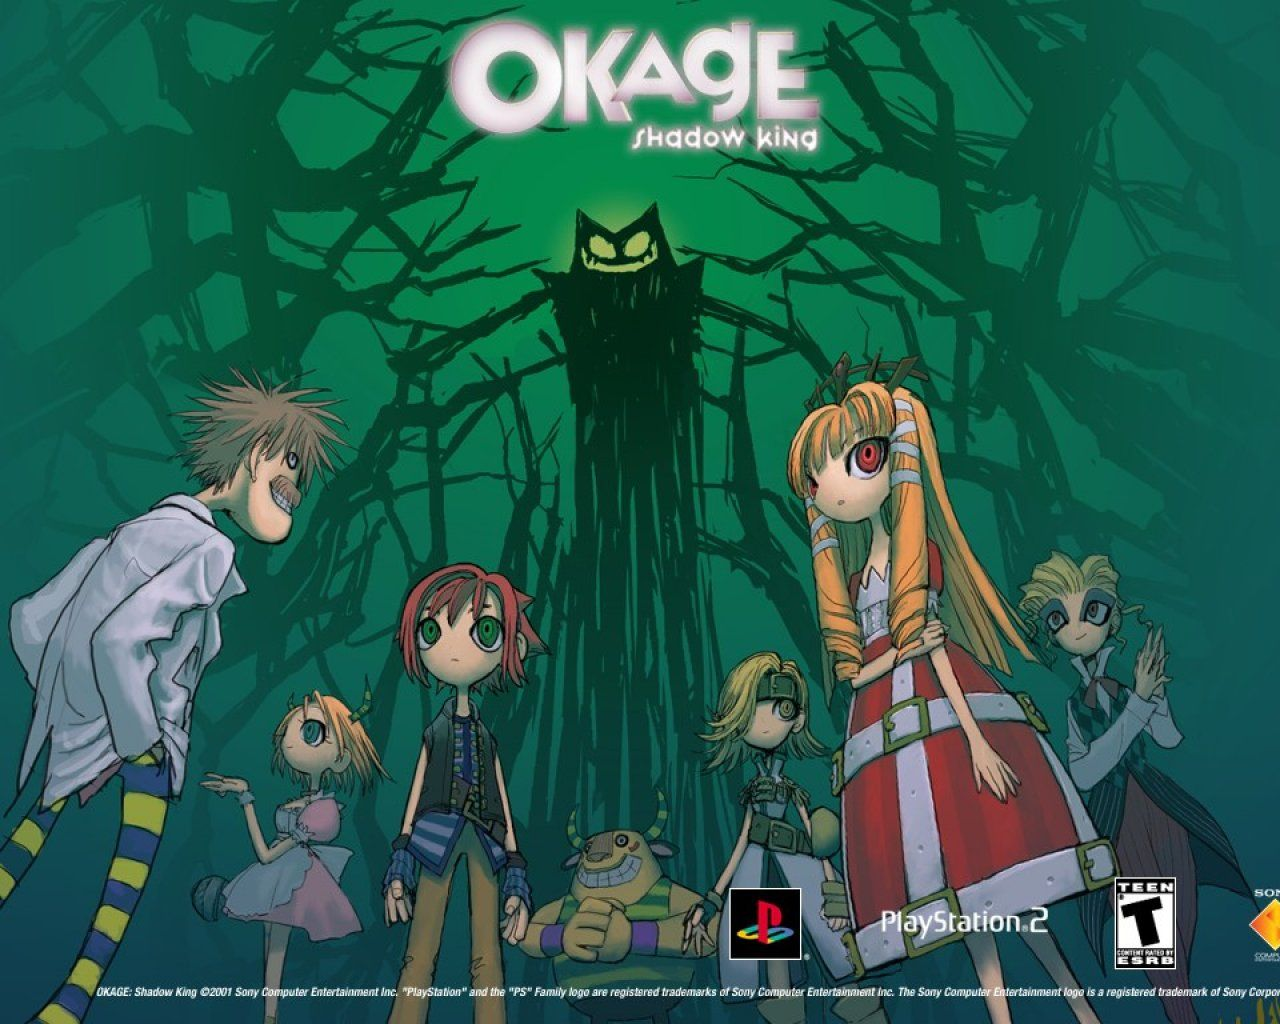 Okage: Shadow King – PlayStation 4 Release bestätigt - http://sumikai.com/games/okage-shadow-king-playstation-4-release-bestaetigt-125129/